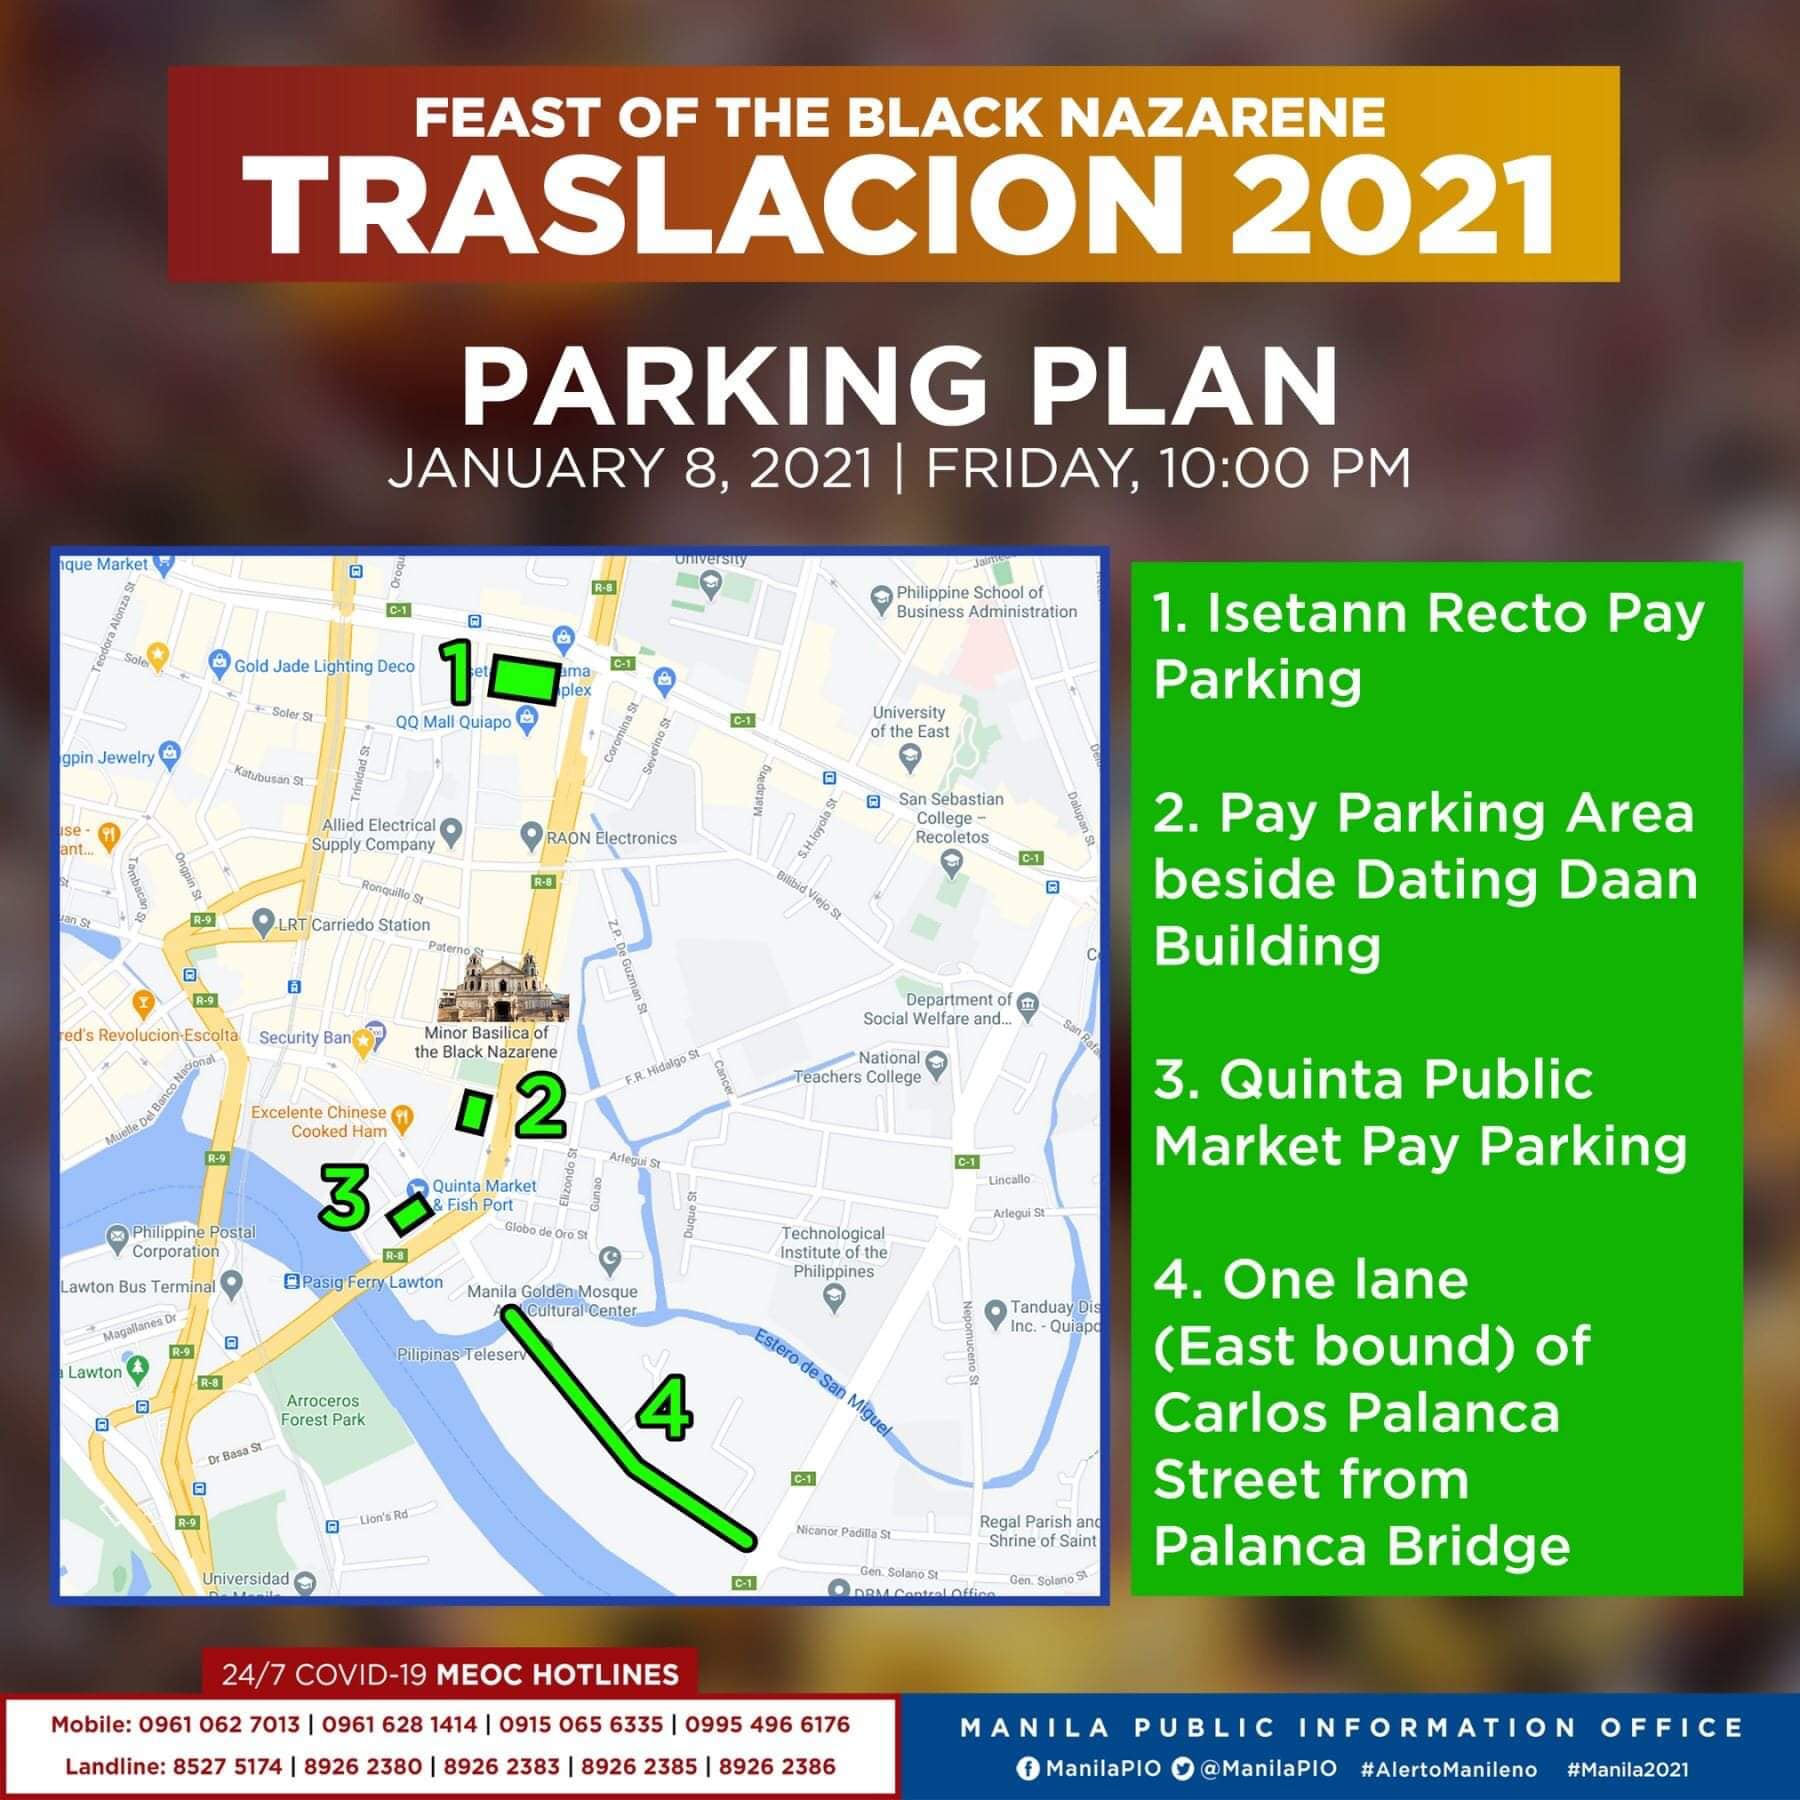 Traslacion Parking plan on January 8, 2021 (10pm onwards) - Recto, Dating Daan, Quinta Public Market, Carlos Palanca St.